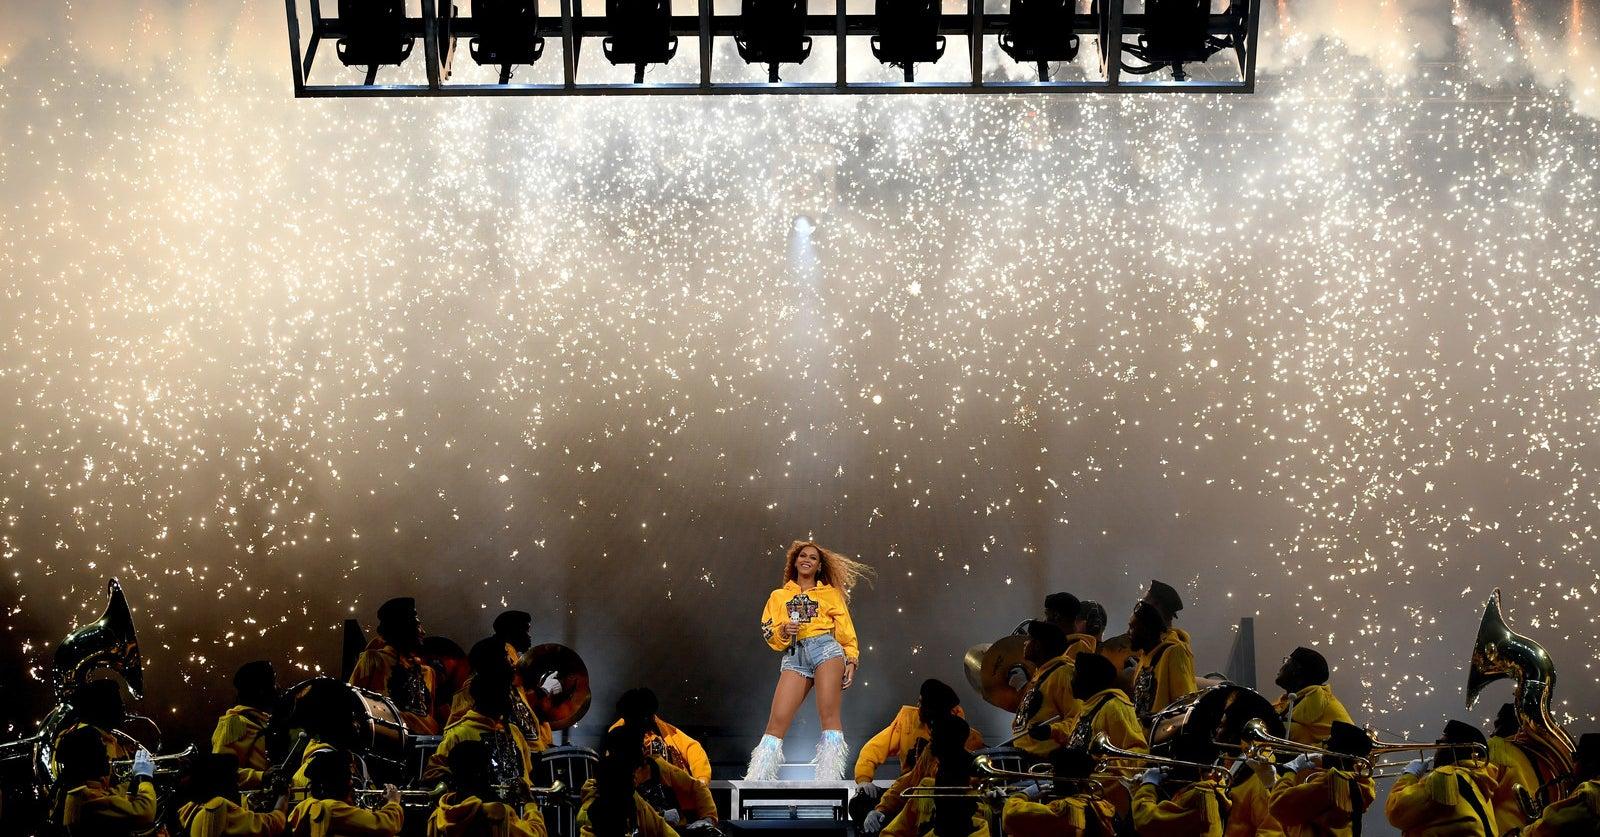 e9c7d7eba5 How Beyoncé Called Out Coachella's Whiteness